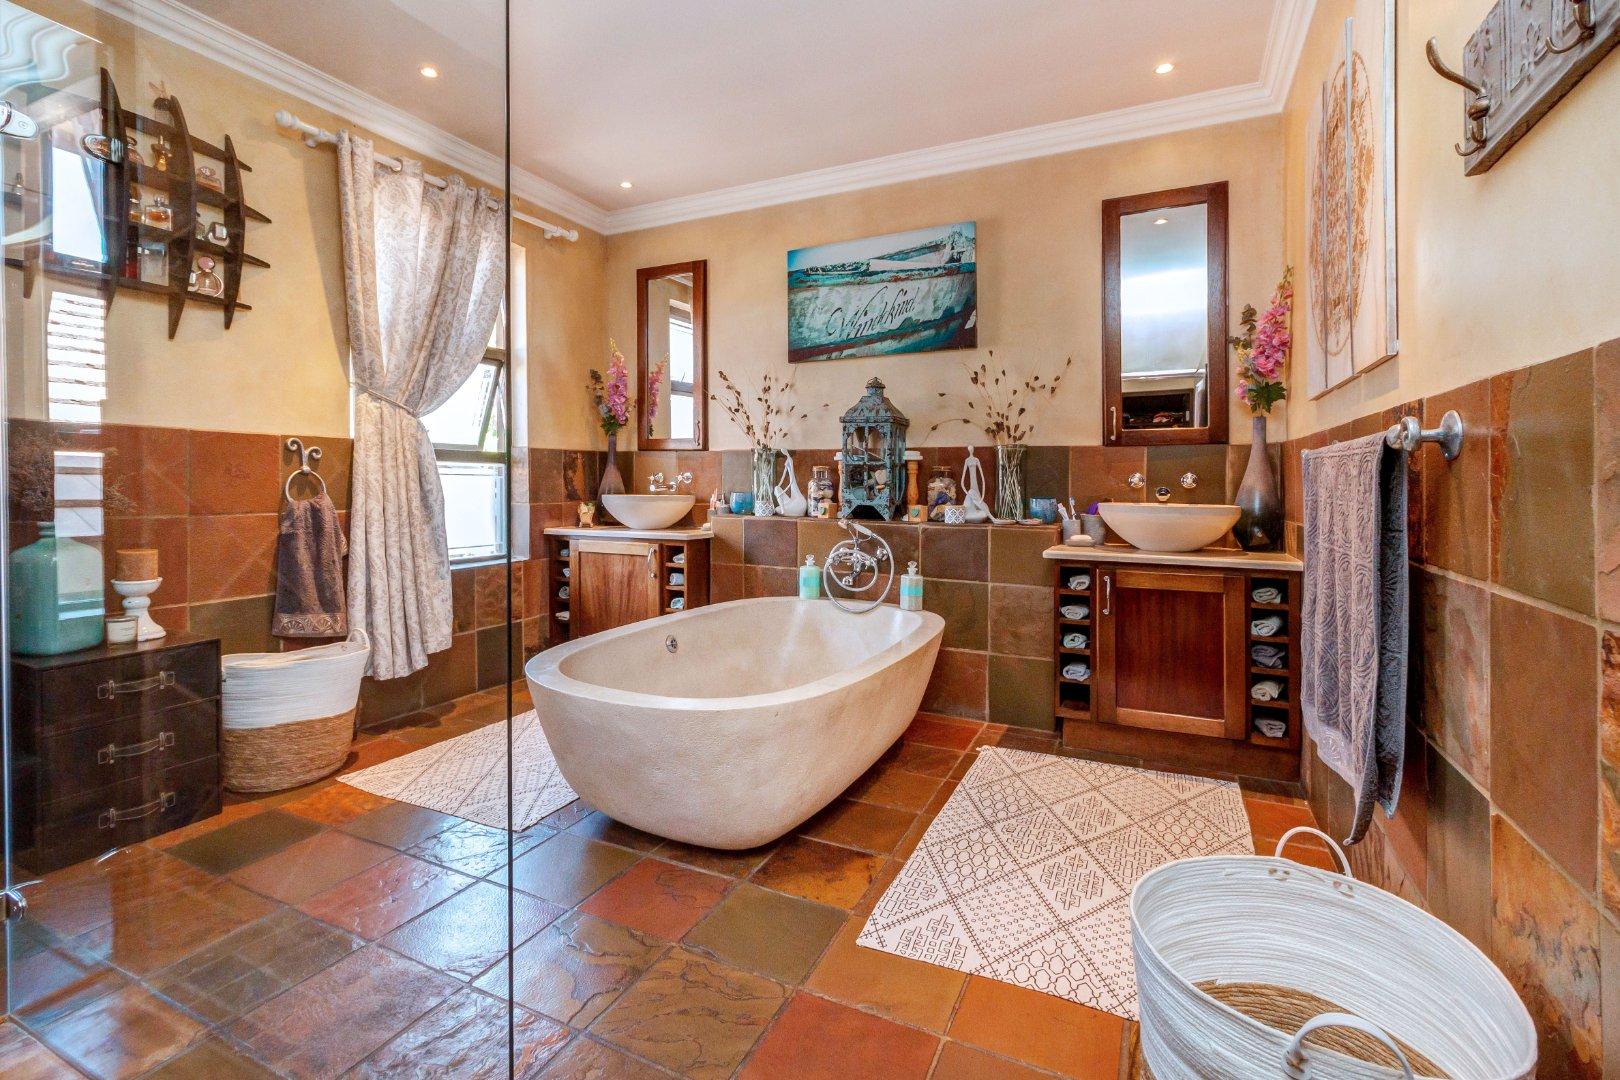 4 Bedroom House For Sale in Cedar Lakes